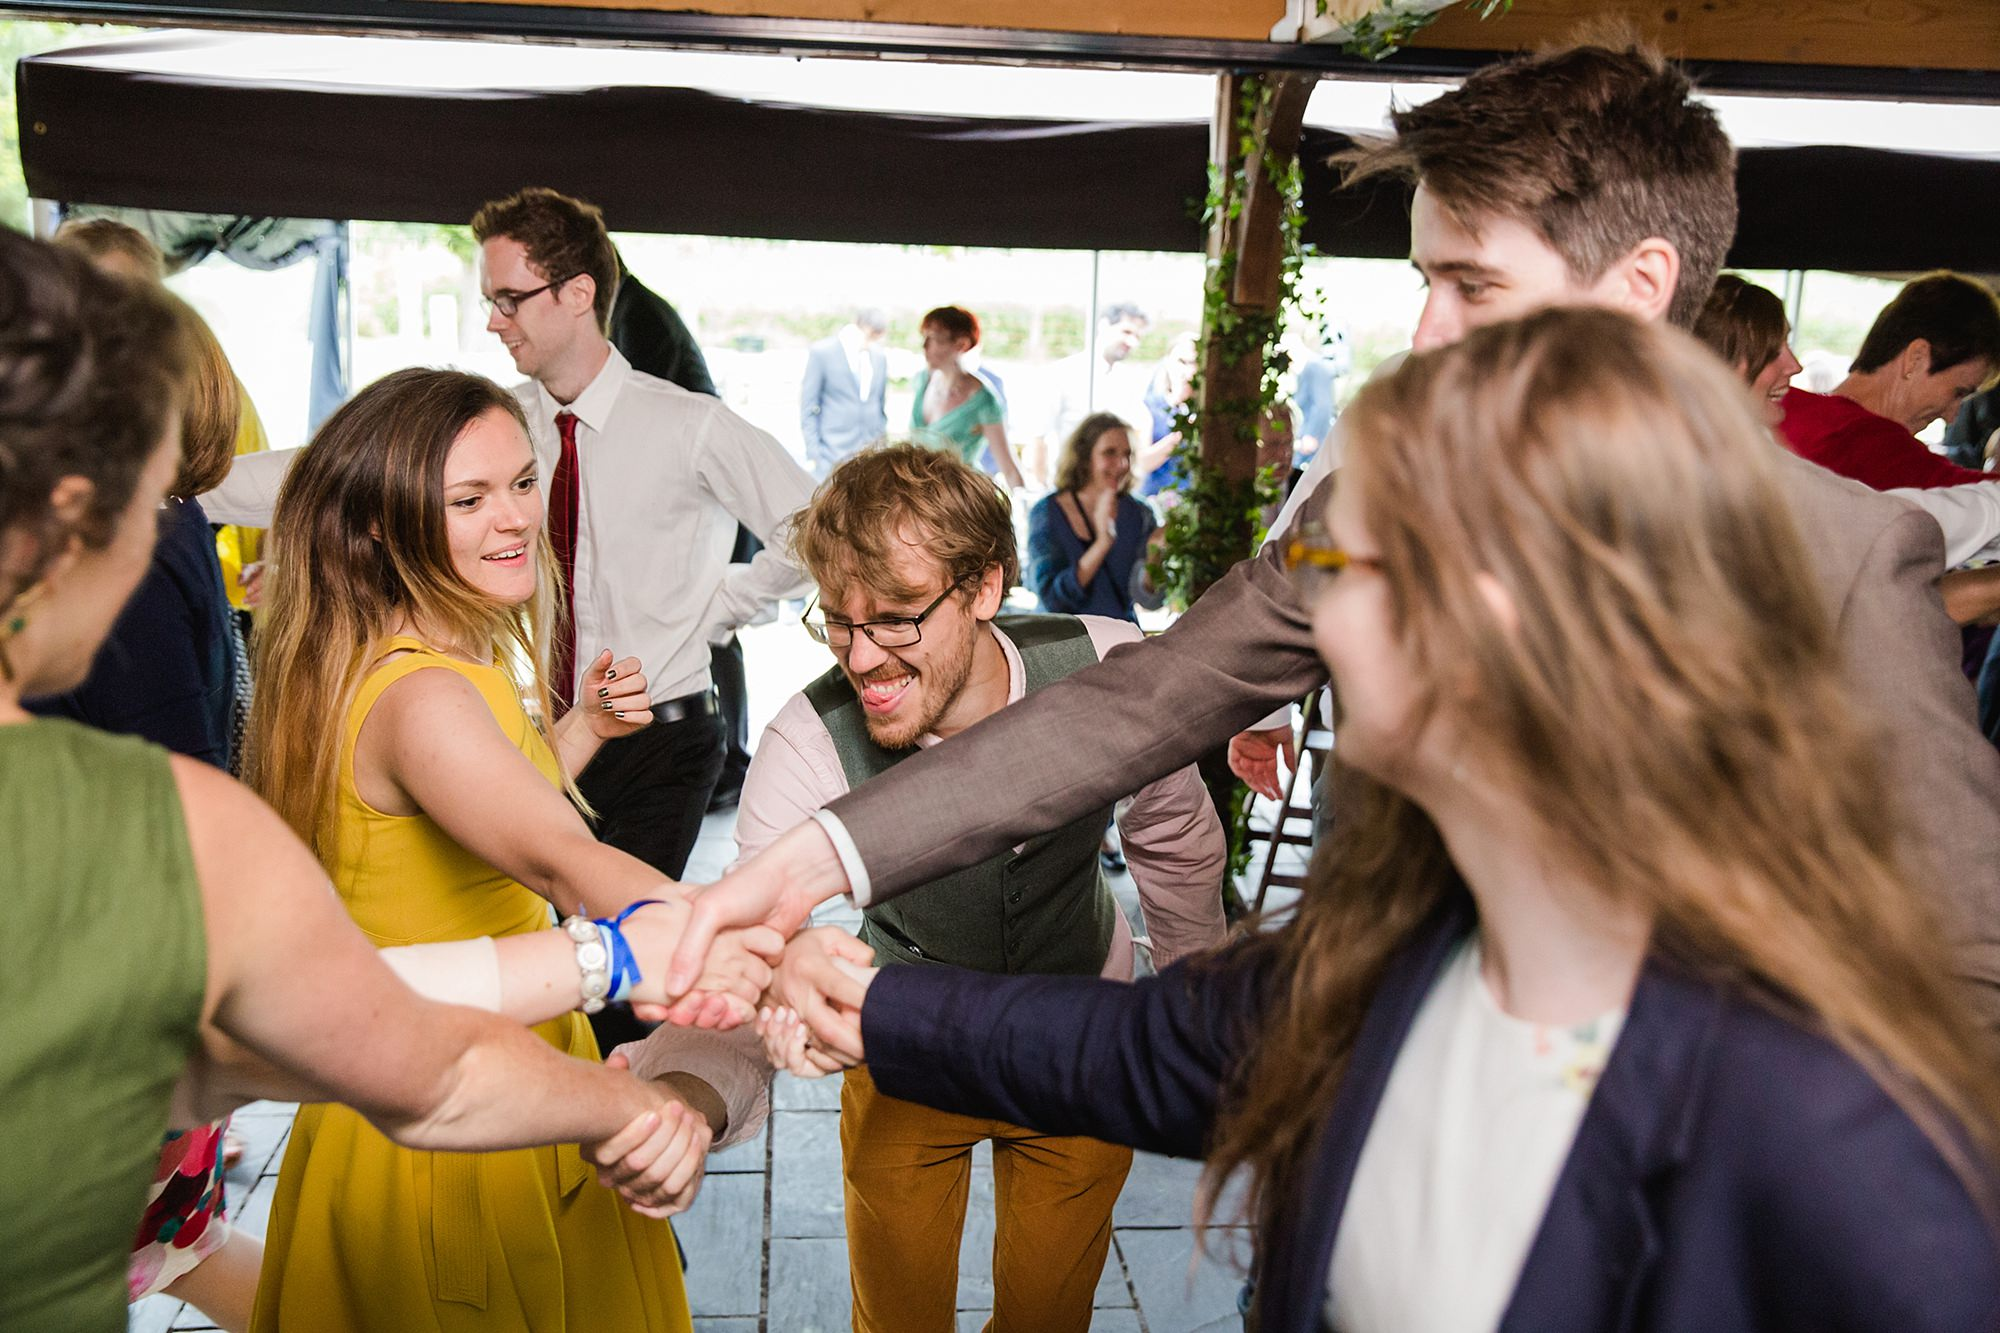 Isis Farmhouse Oxford Wedding fun guests dancing